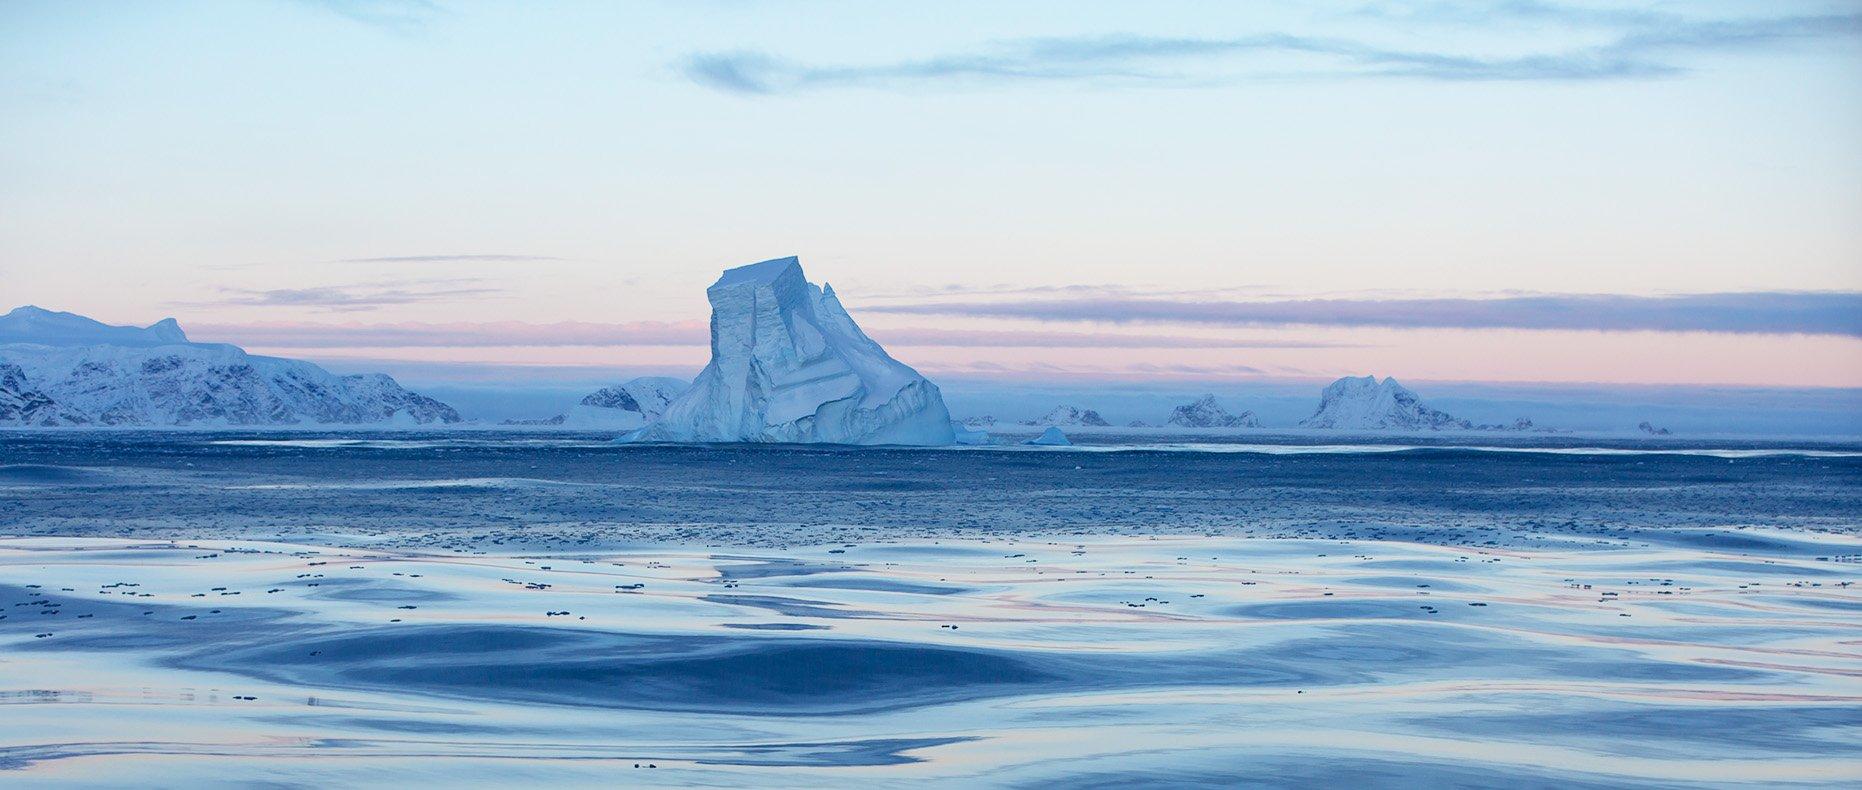 Antarctica - sustainable fishery